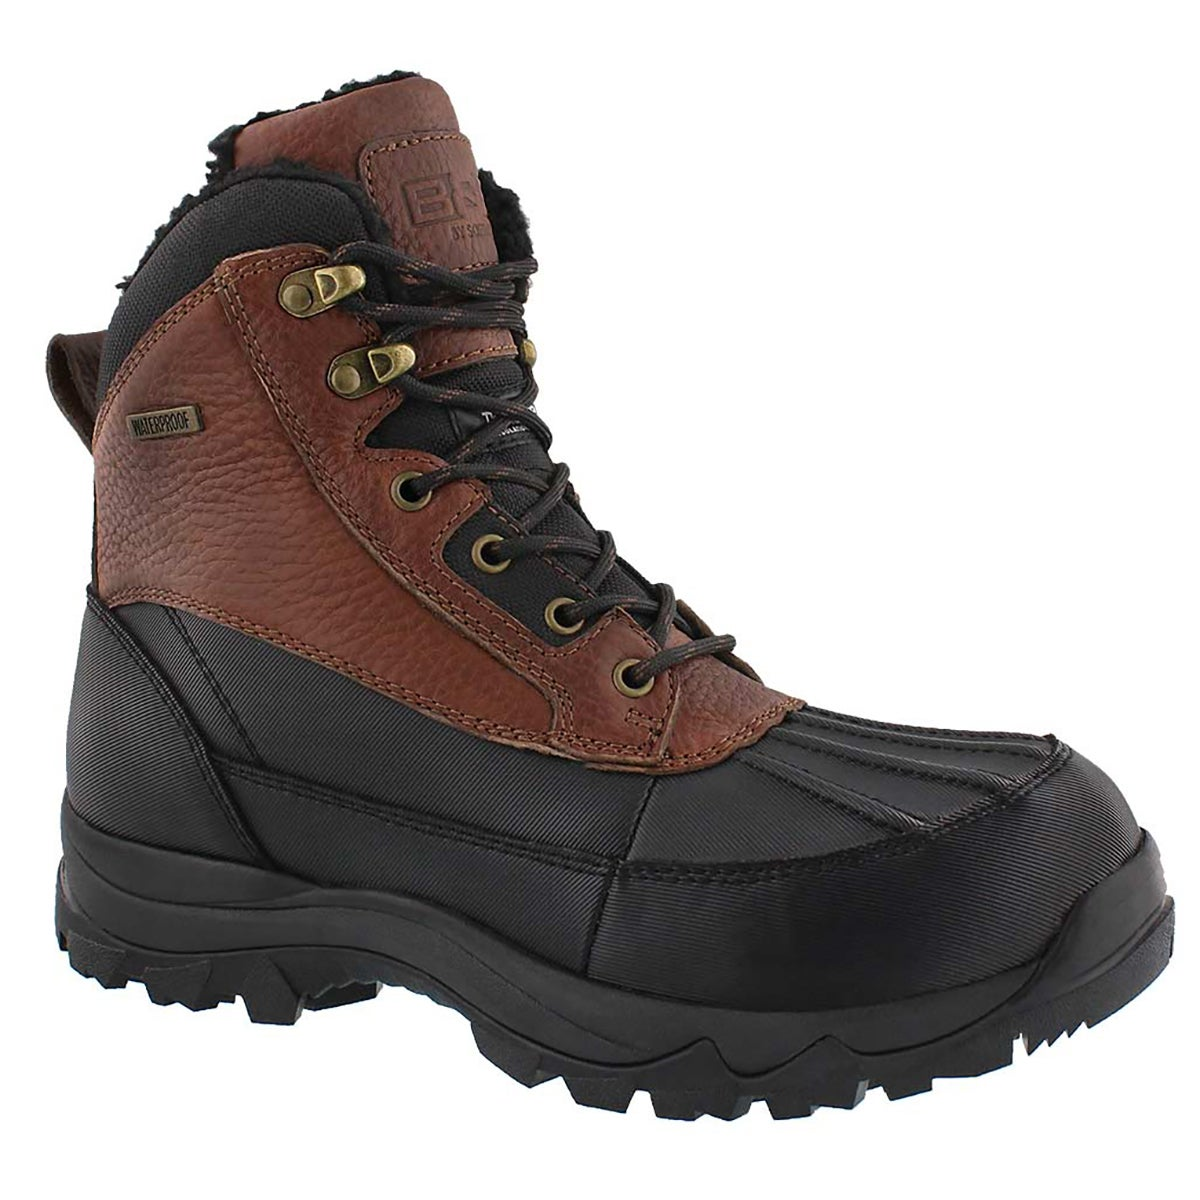 Men's MURHY brown waterproof winter boots